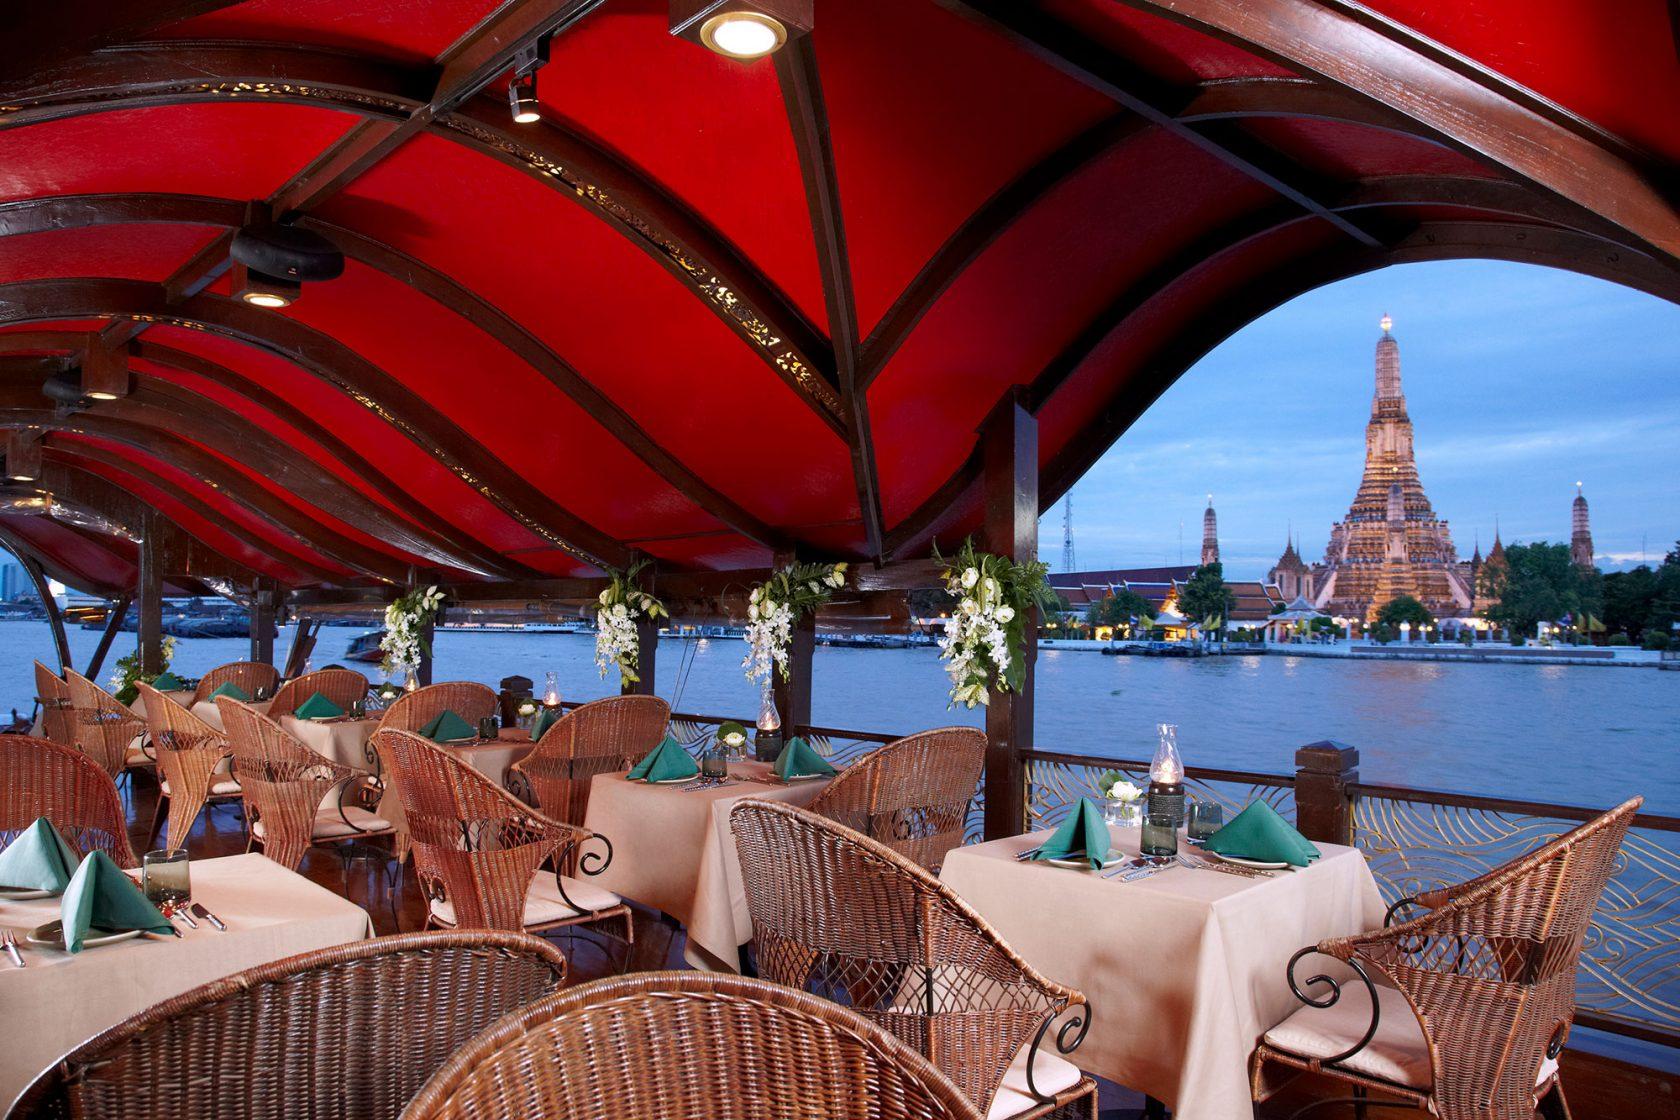 Anantara Riverside Bangkok Manohra Dining Cruises